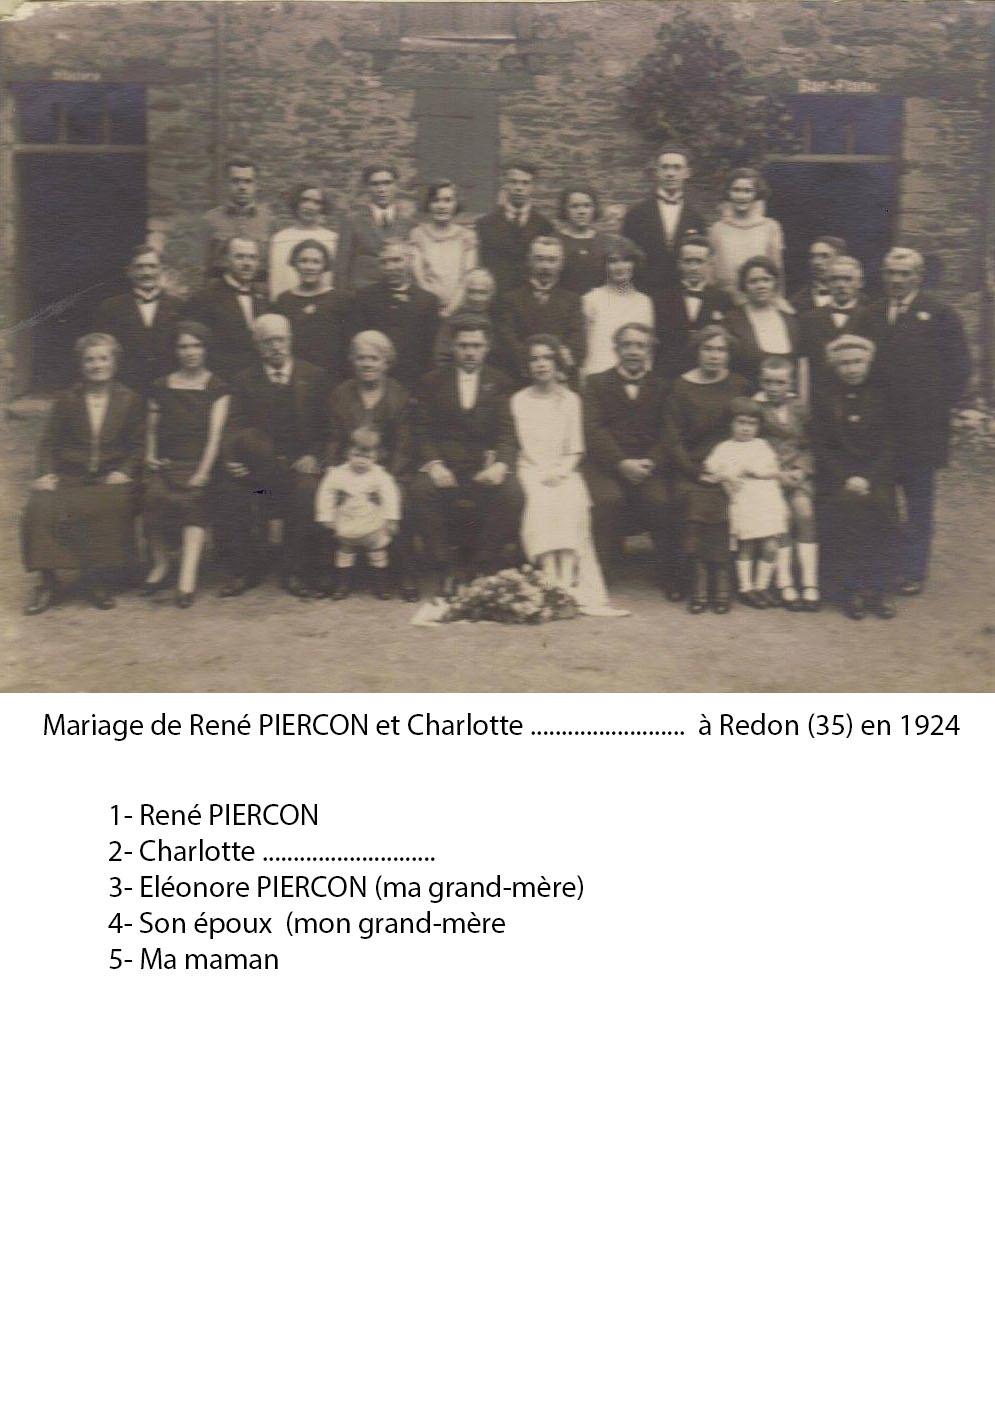 Zone 35 - Redon - Mariage - PIERCON René et Charlotte - 1924 - Vue 02 (Françoise Lebreton)